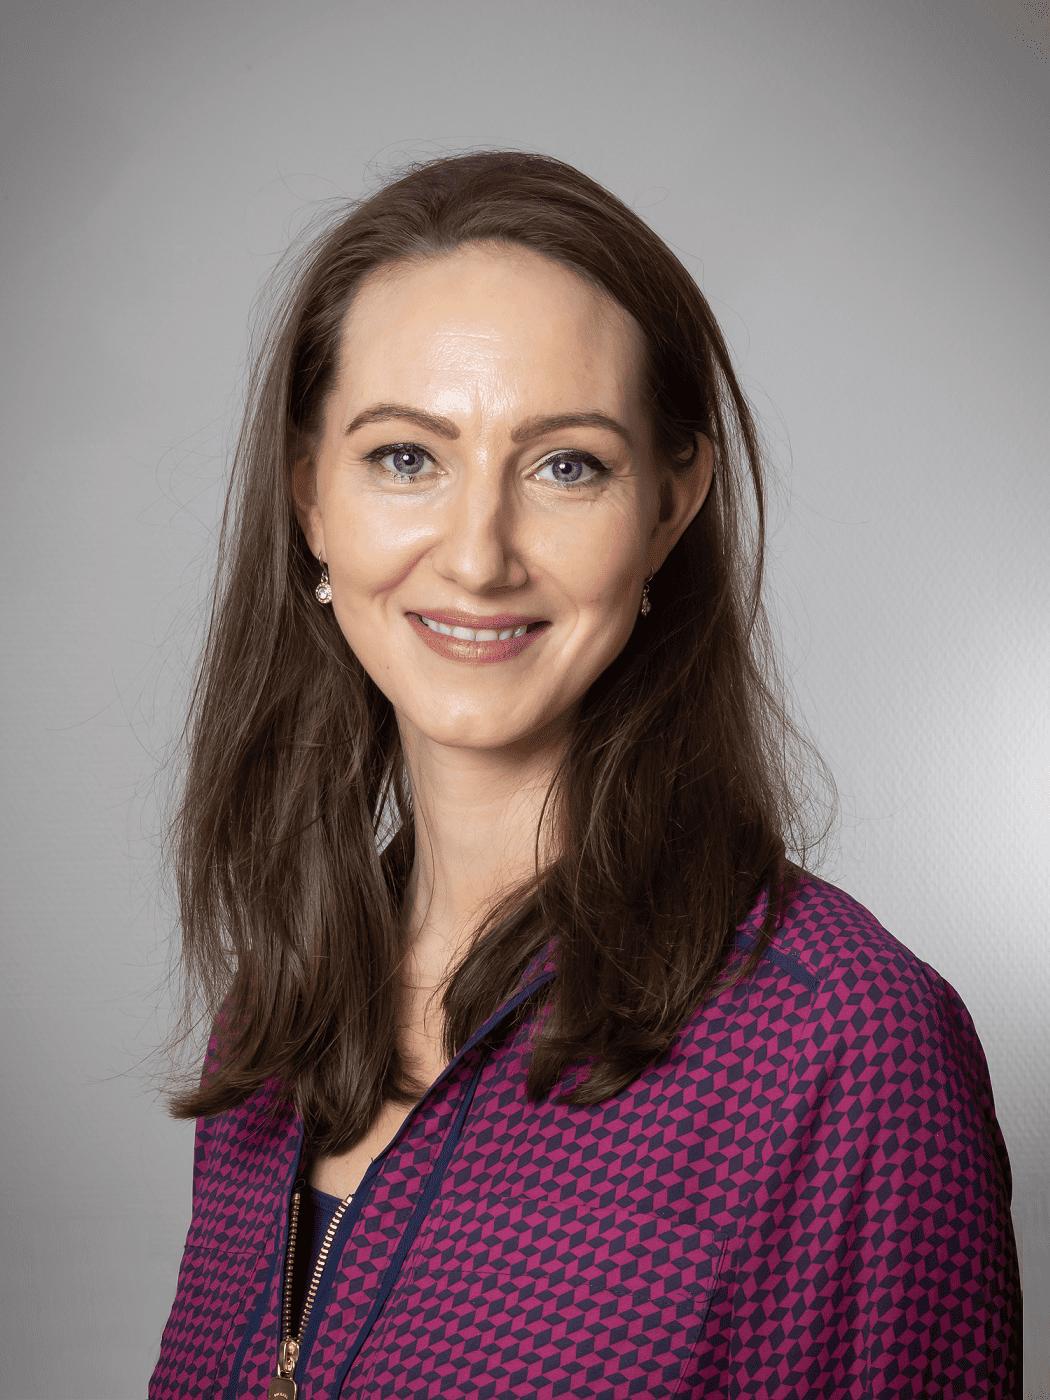 Laura McDonnel